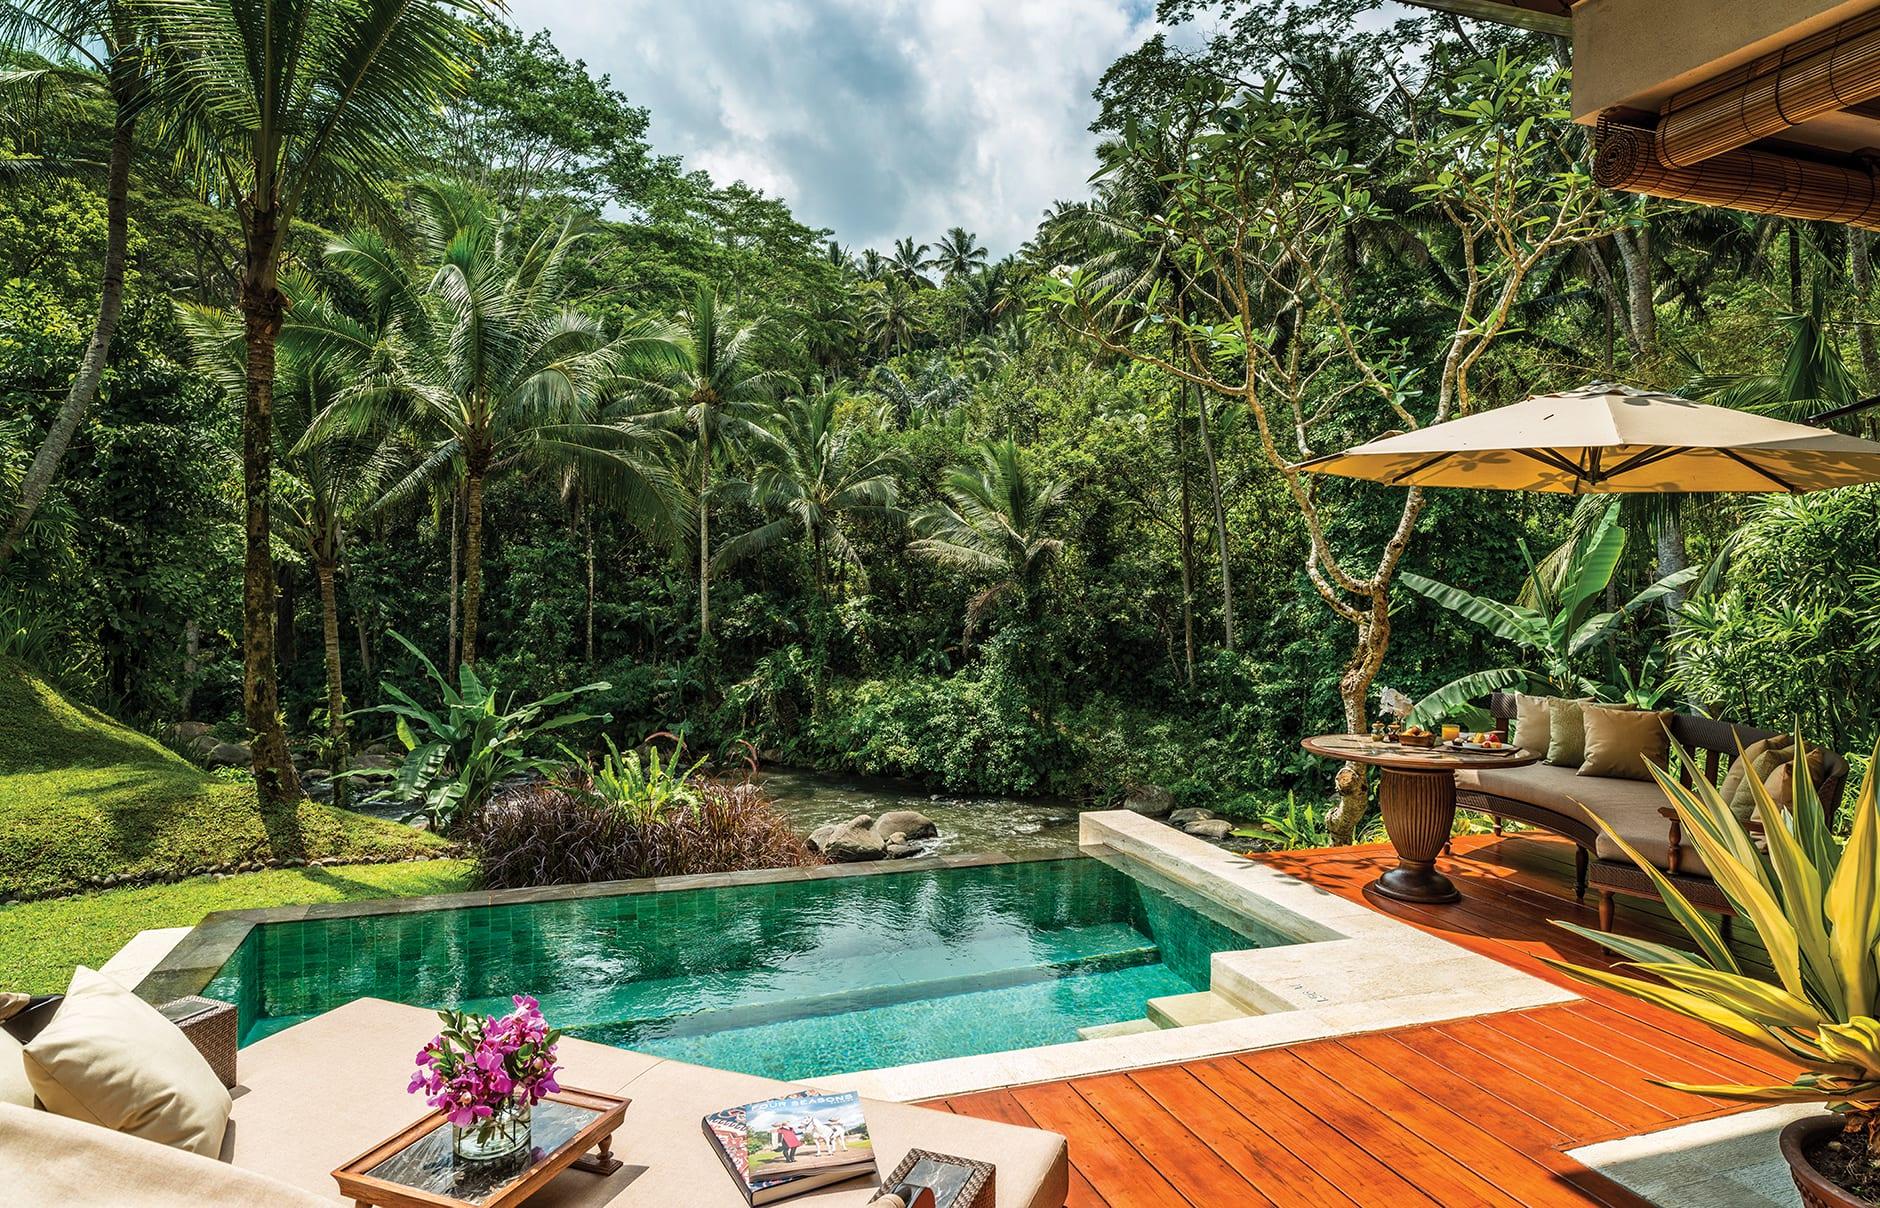 Four Seasons Resort Bali at Sayan. © Four Seasons Hotels Limited